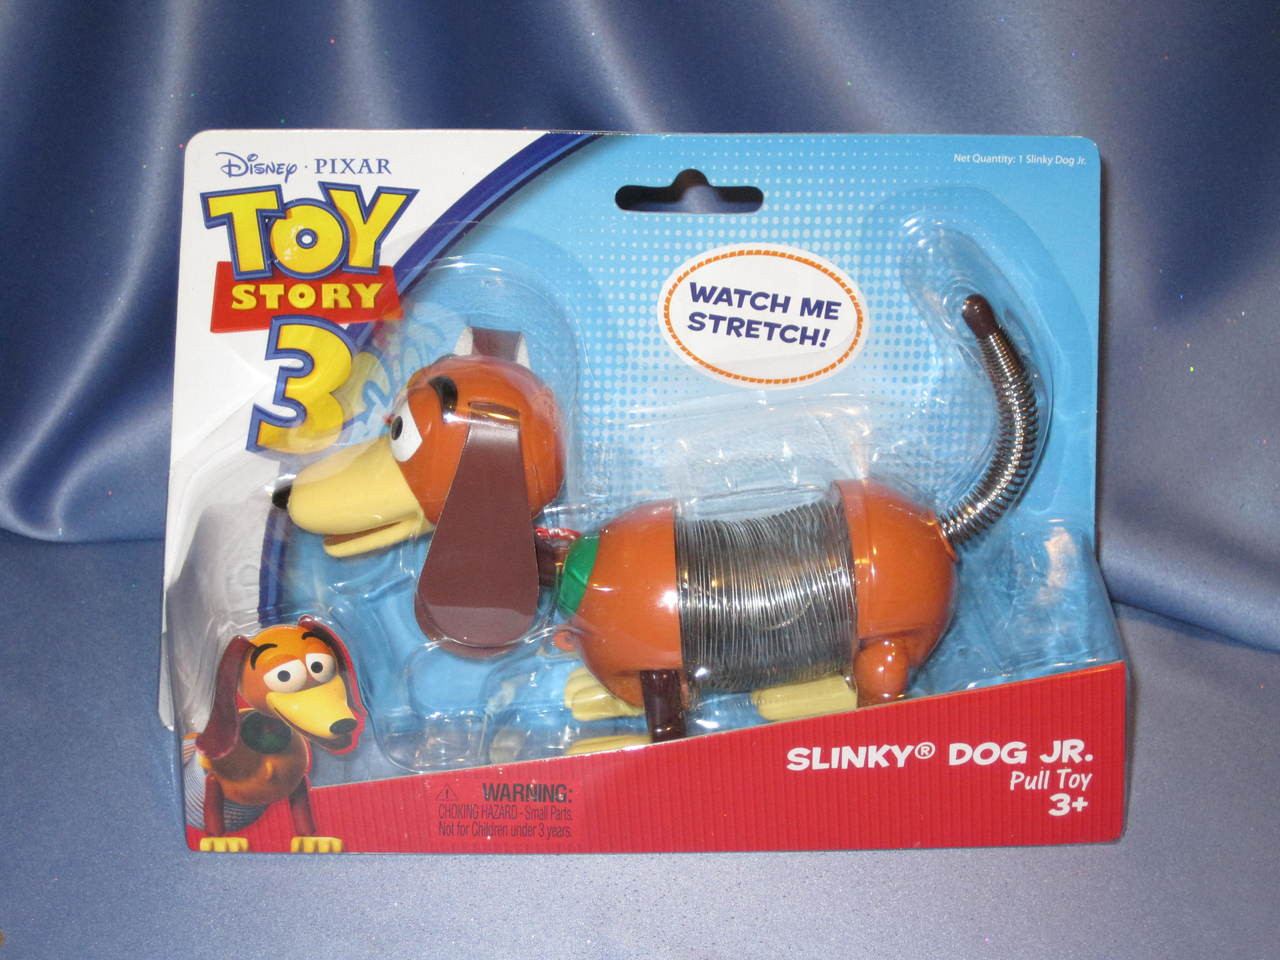 Slinky Dog Jr. - Toy Story 3 - Disney - Pixar.